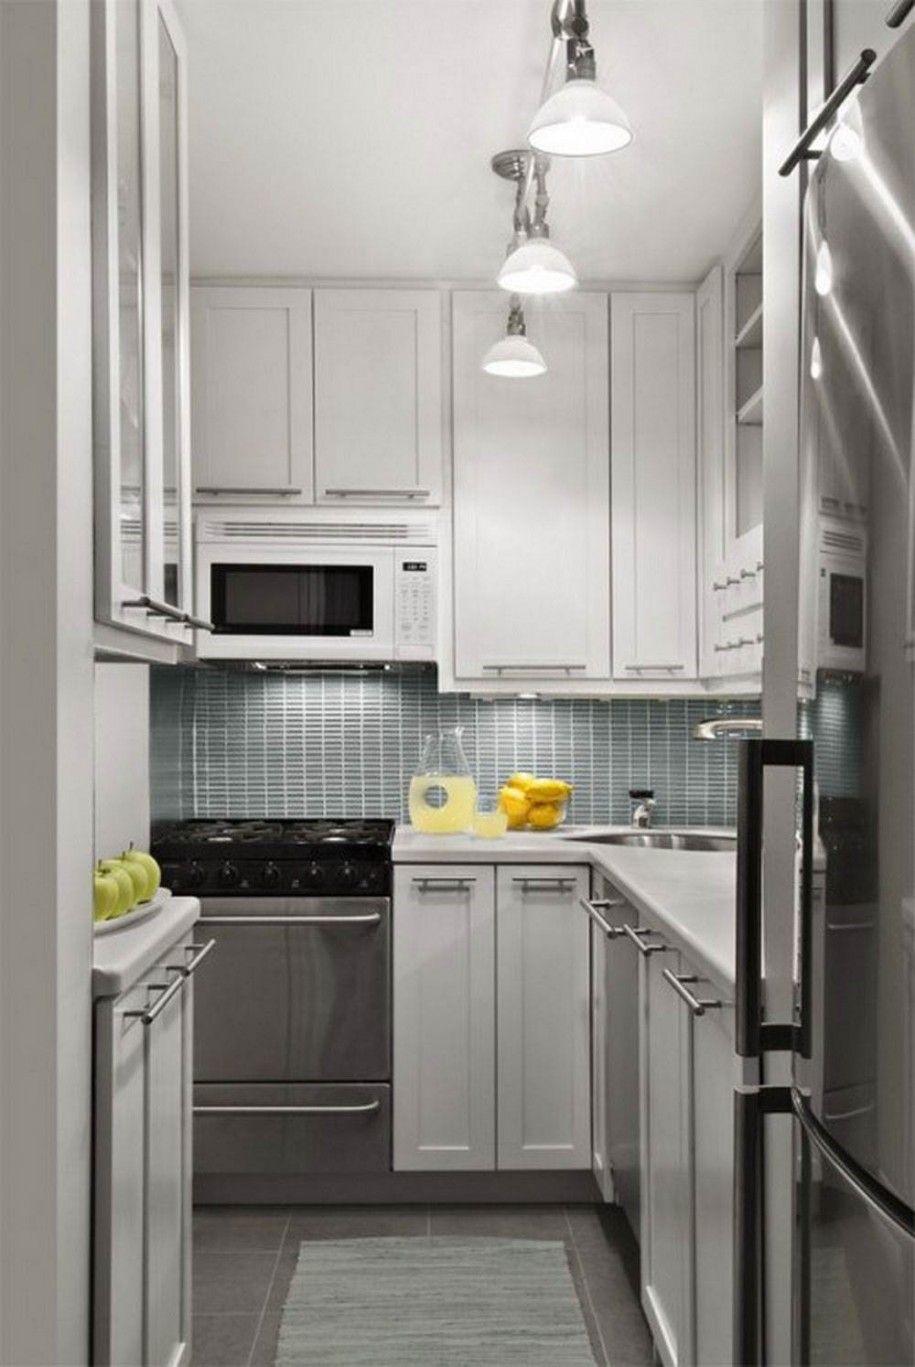 track lighting in the kitchen. Exellent Track Elegant White Kitchen With Backsplash Tile Along Track Lighting  Design Using Lamp Ideas In The